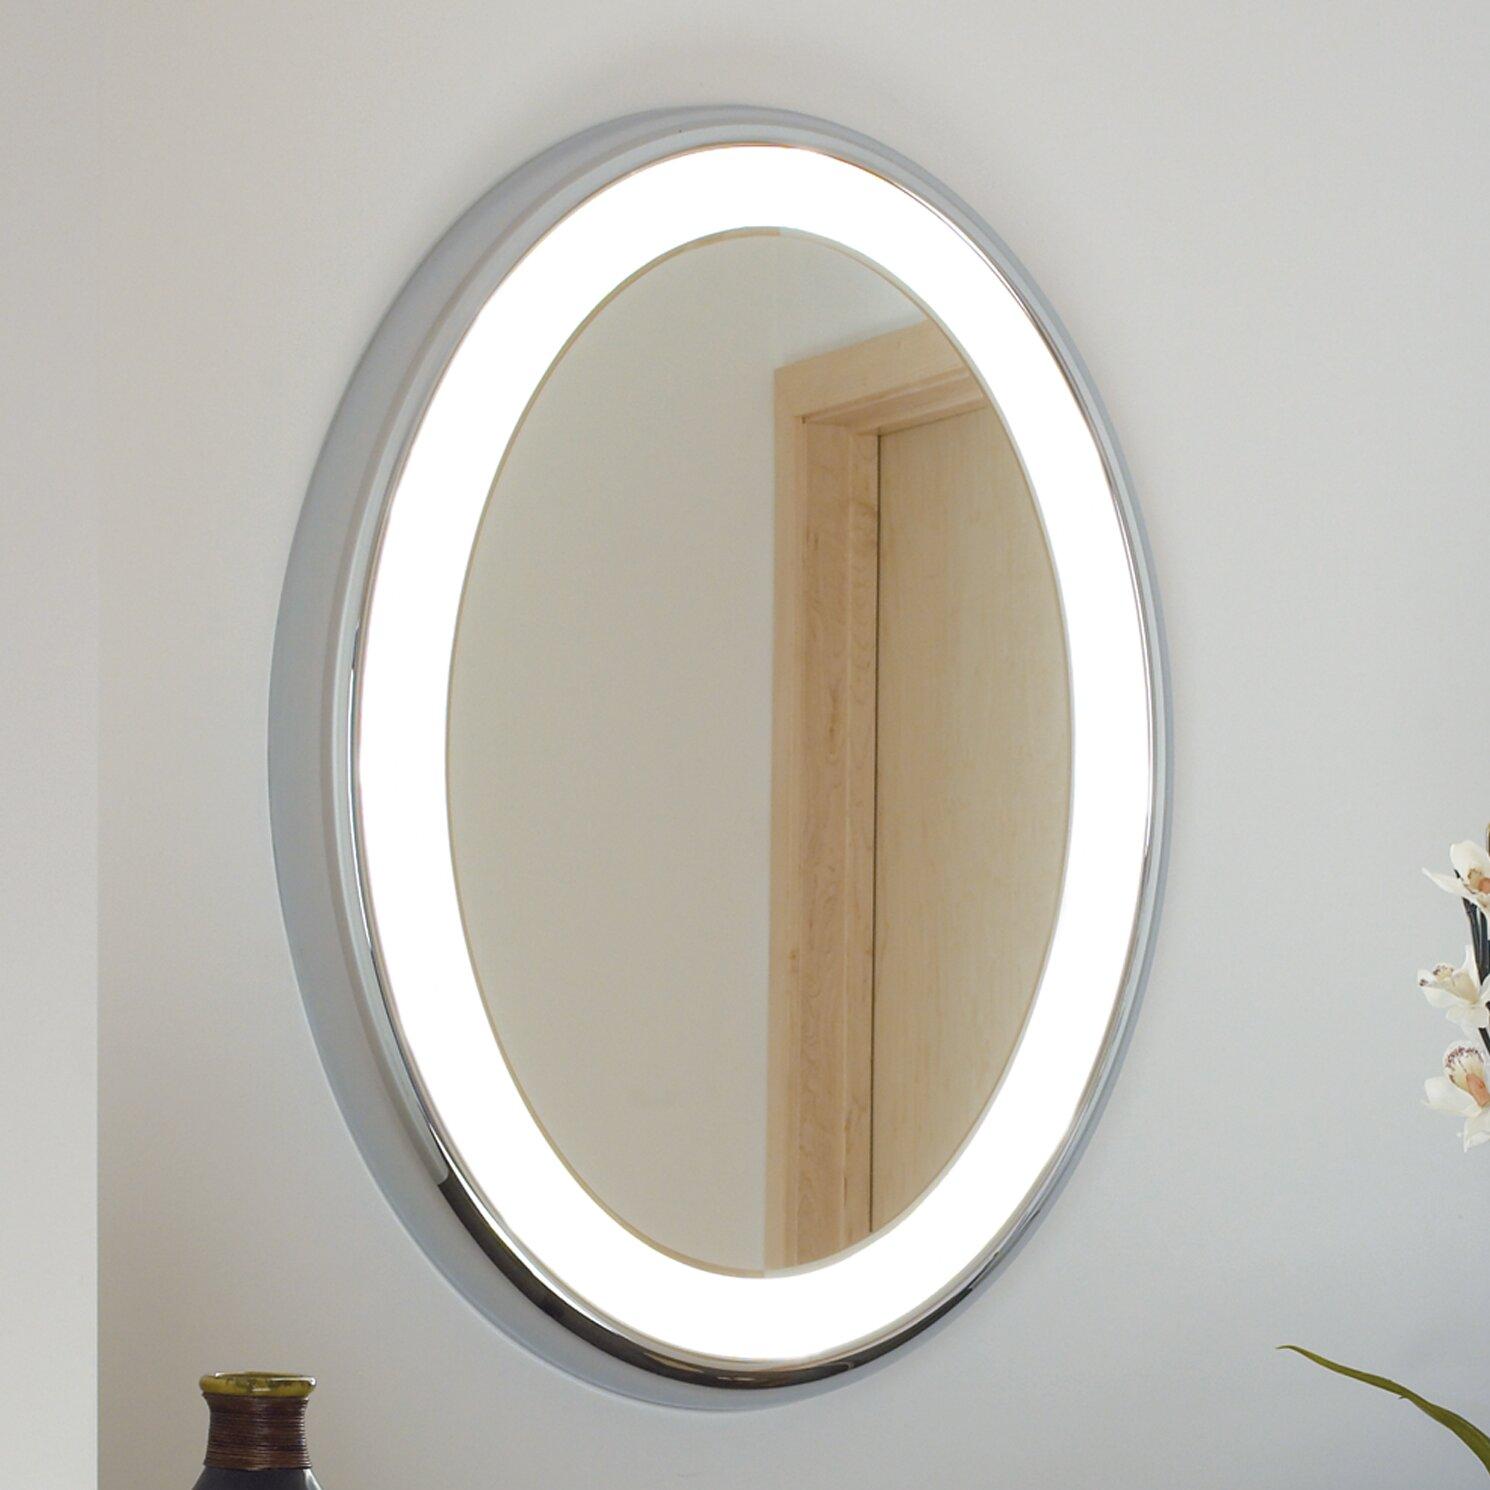 Wayfair oval bathroom mirrors 28 images mirror wayfair for Oval bathroom mirrors